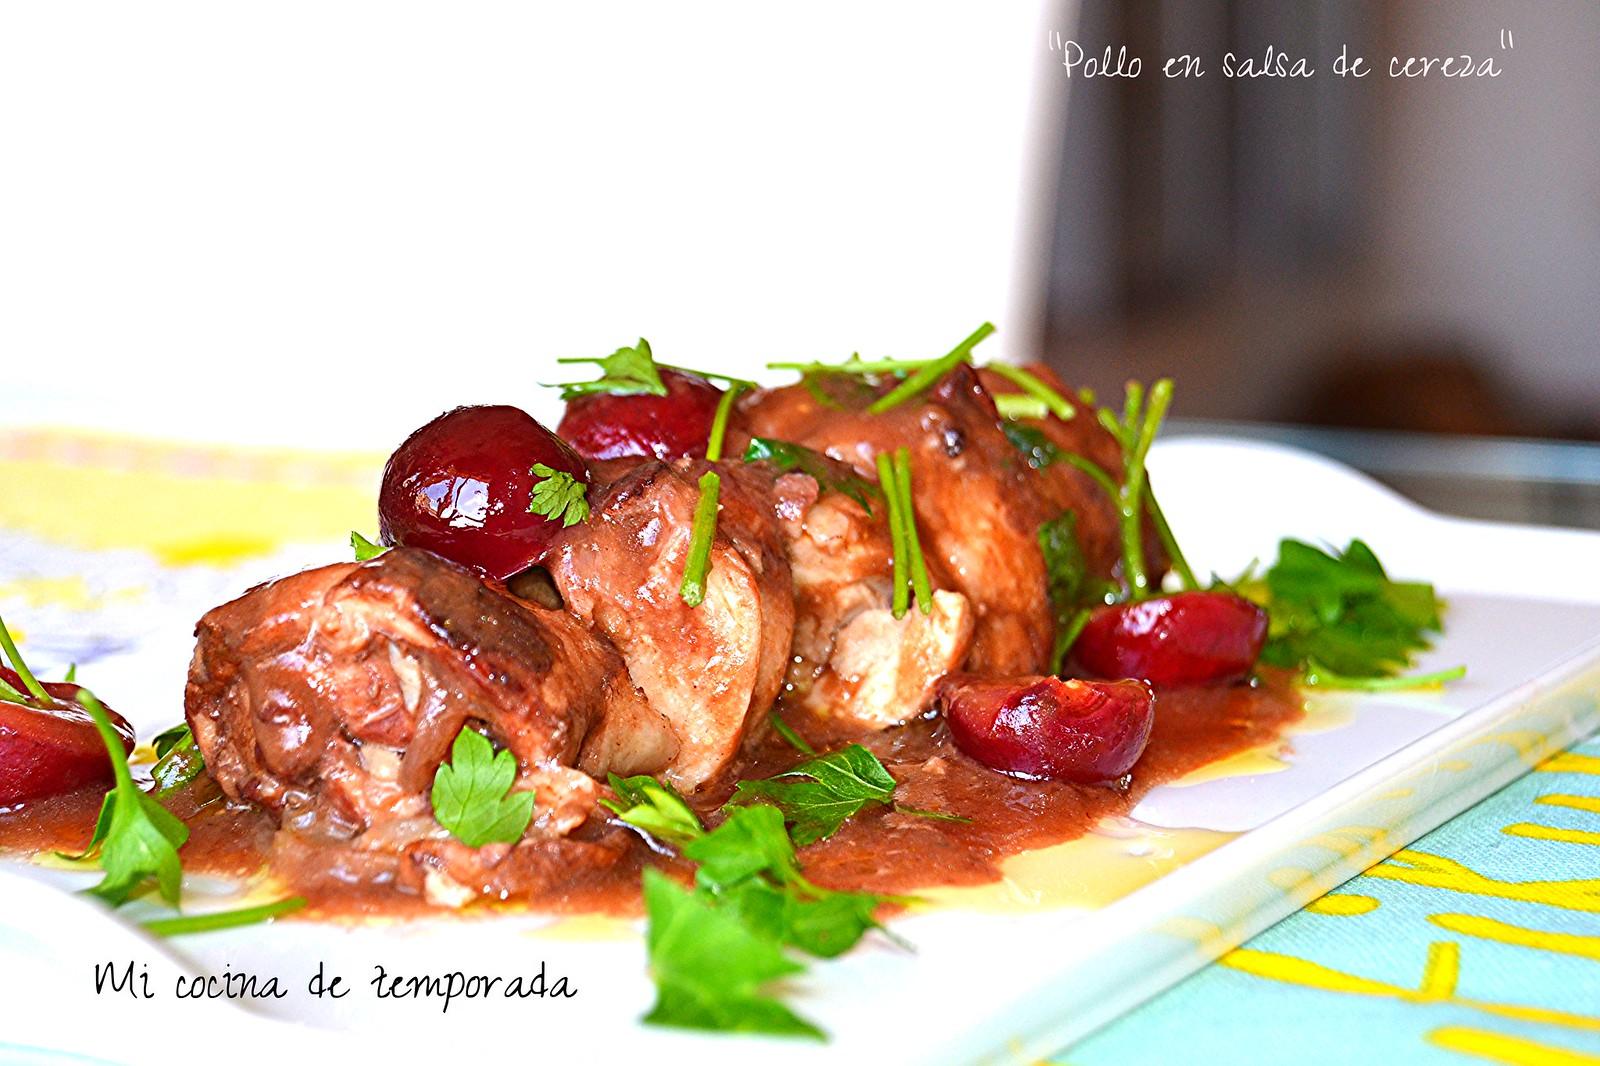 Pollo en salsa de cerezas 007